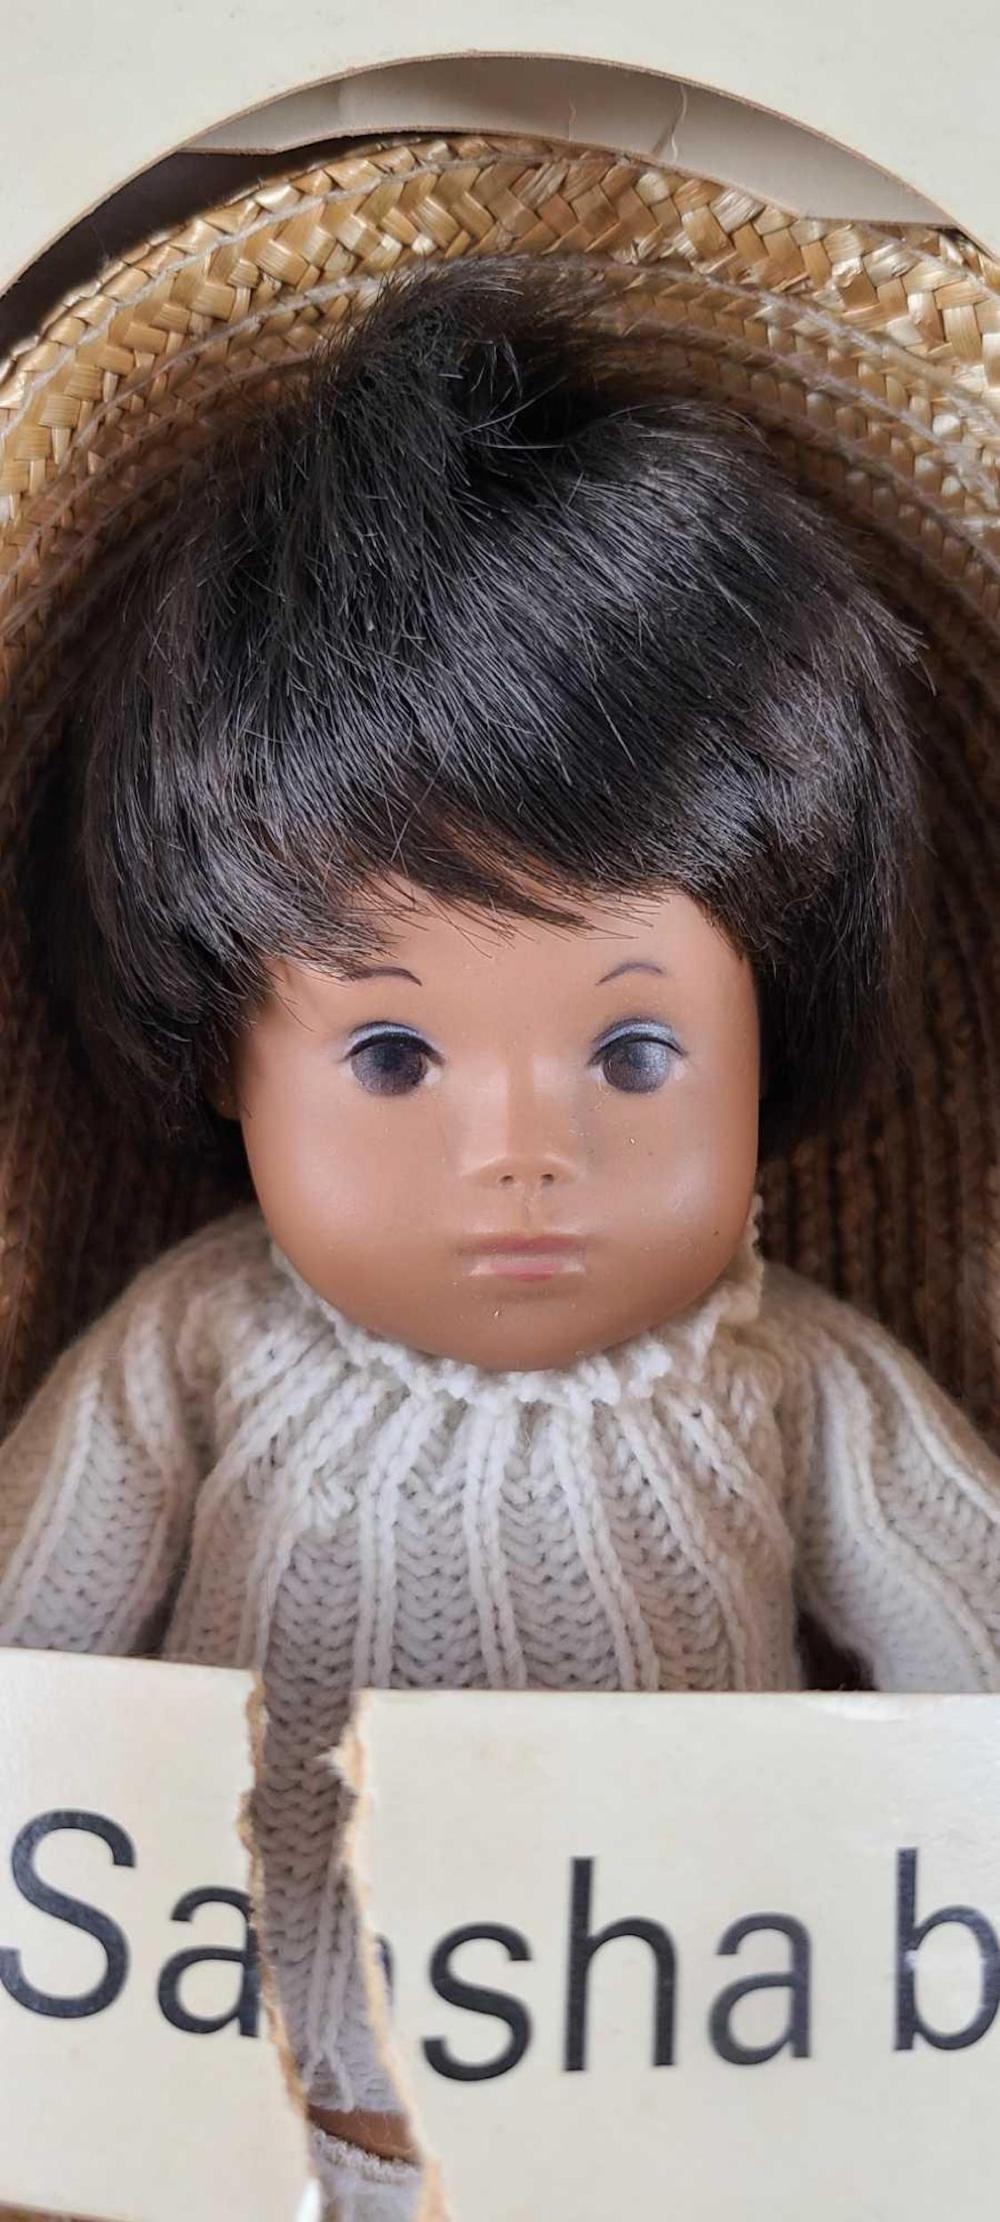 2 Sasha baby dolls